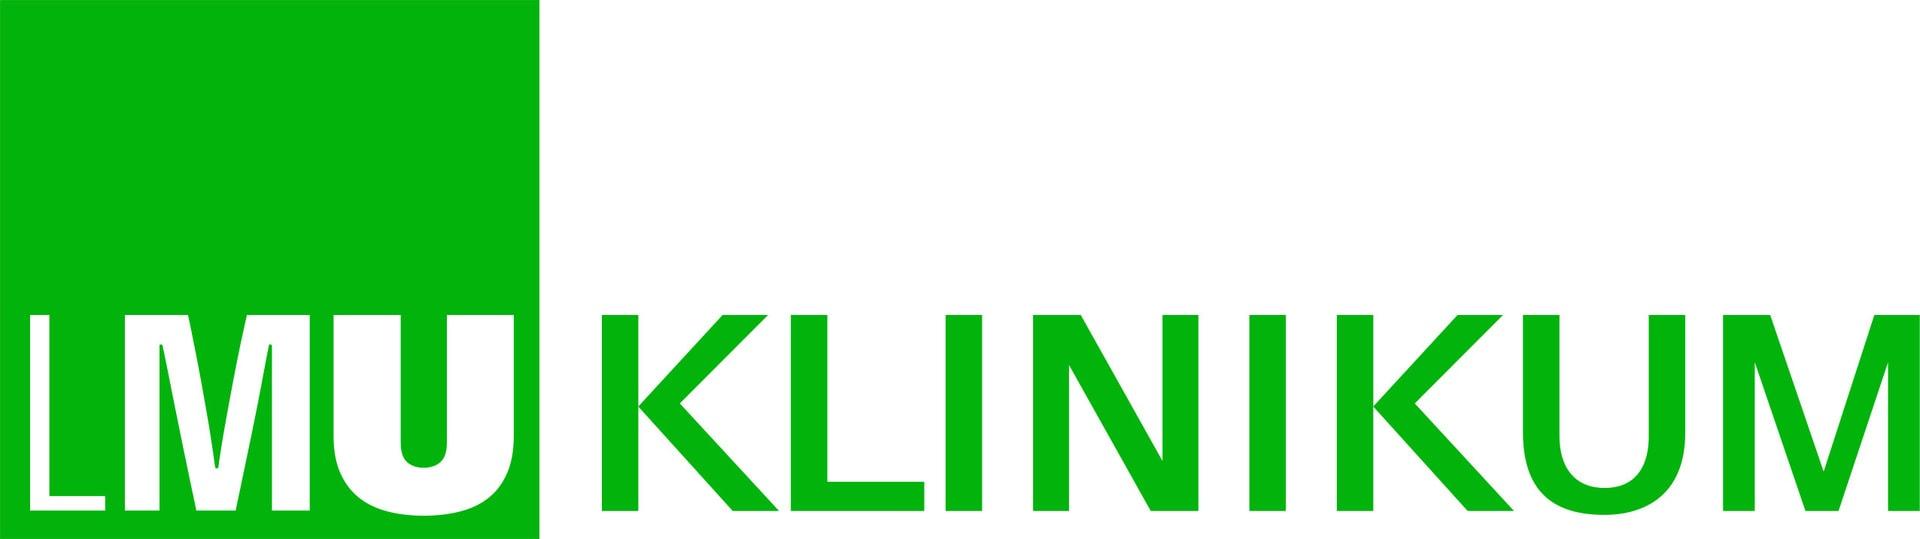 LMU KLINIKUM Logo gruen